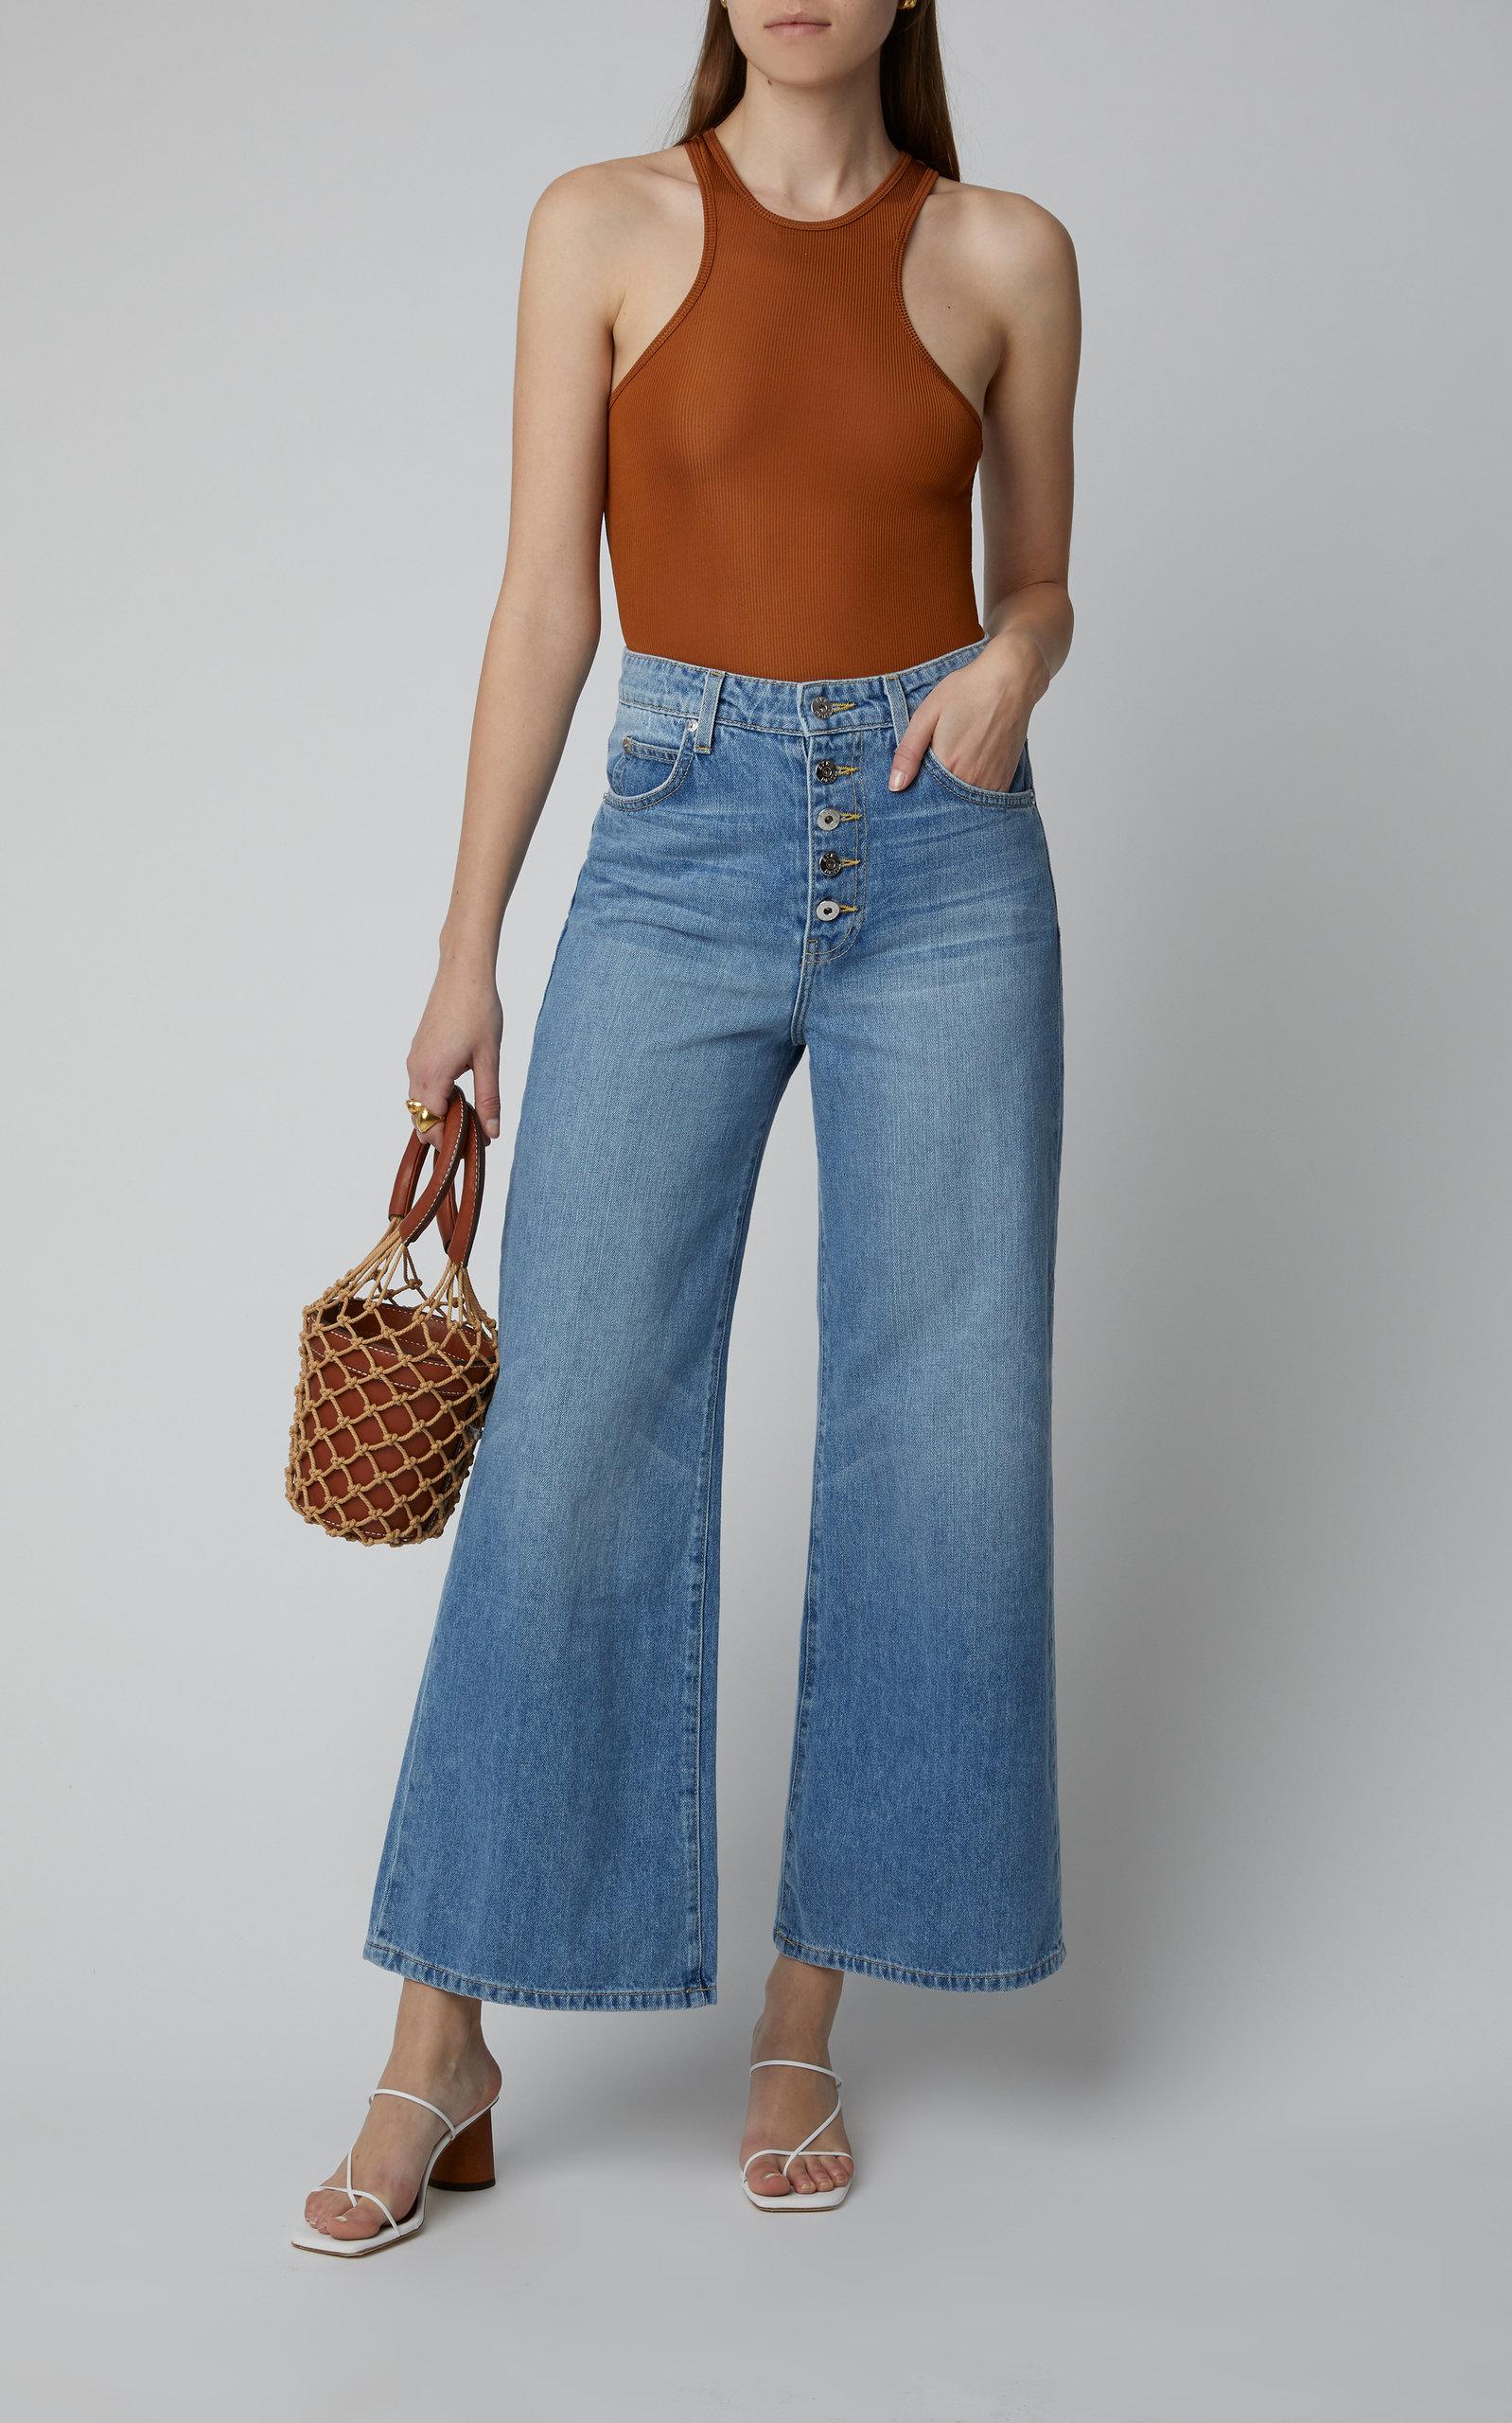 Eve Denim, Charlotte Hight-Rise jeans